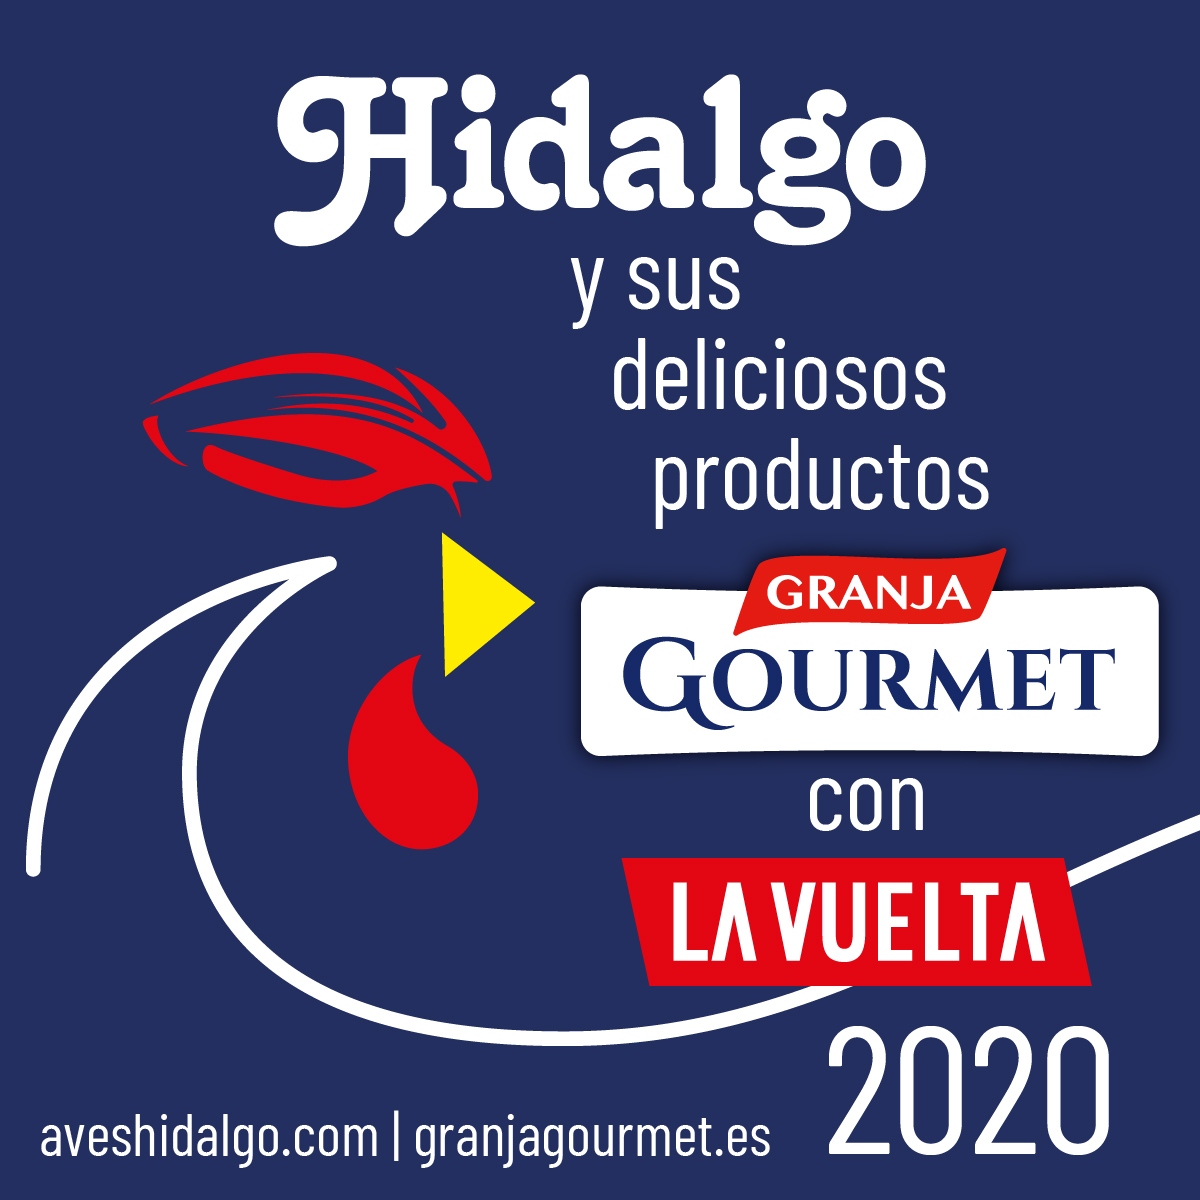 Hidalgo Vuelta Ciclista a España 2020. LA VUELTA